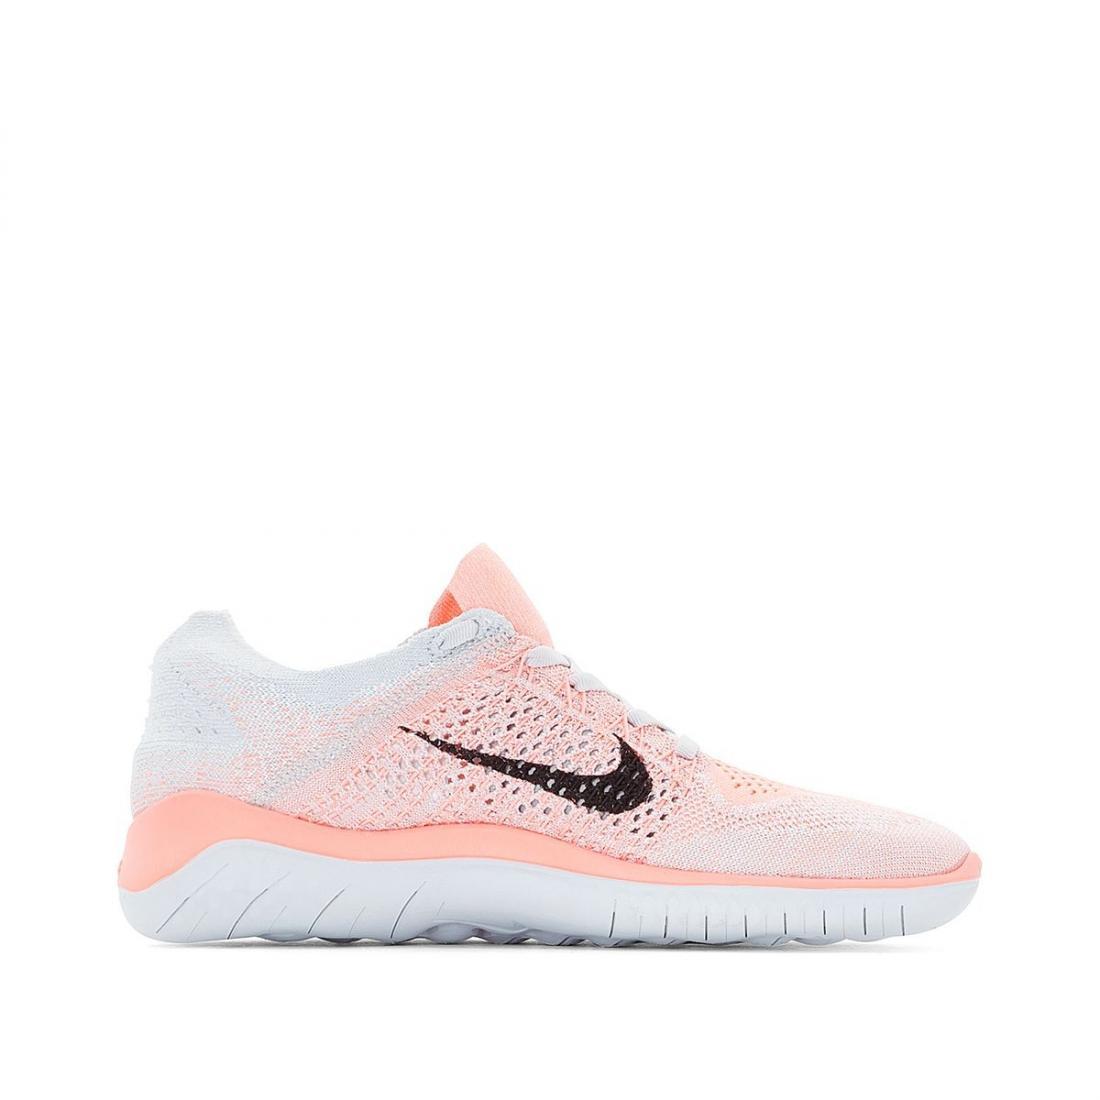 chaussure nike femme rose noir